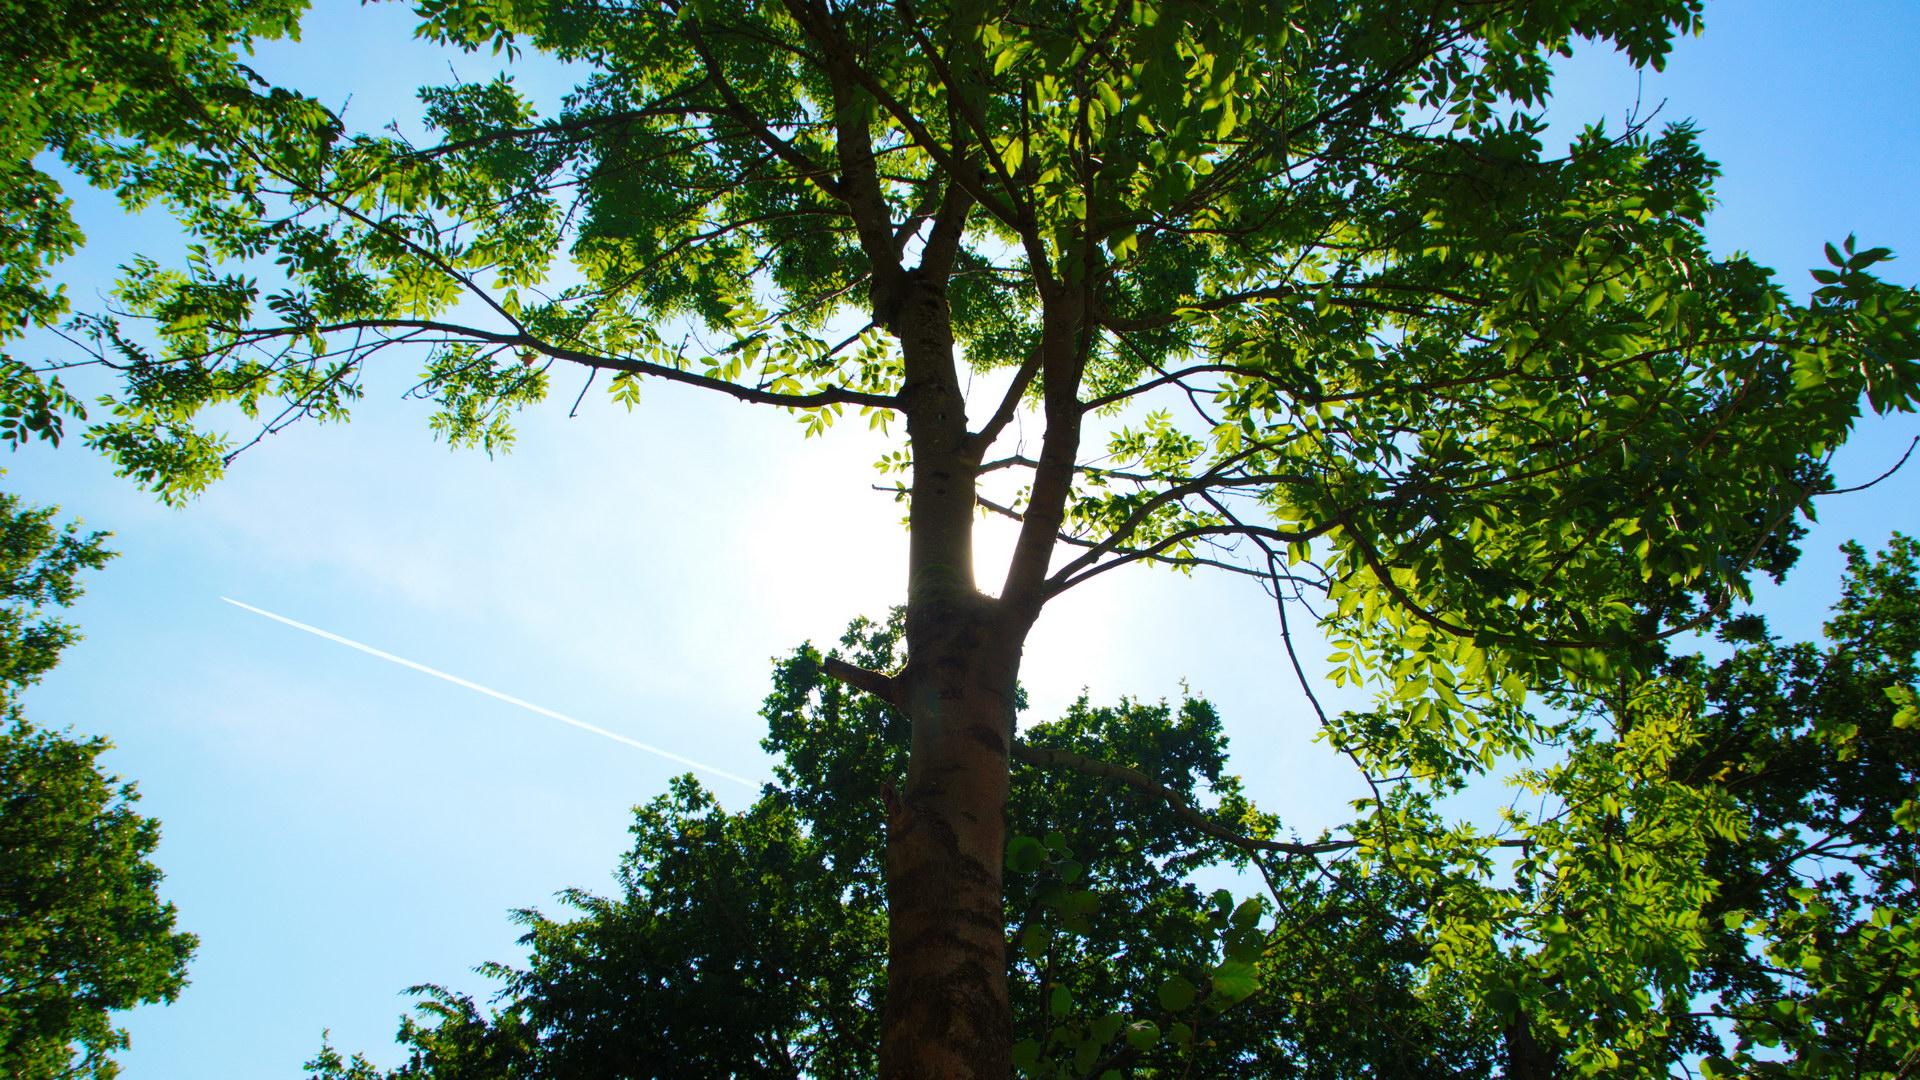 Sonne hinter Baum Grün blauer Himmel